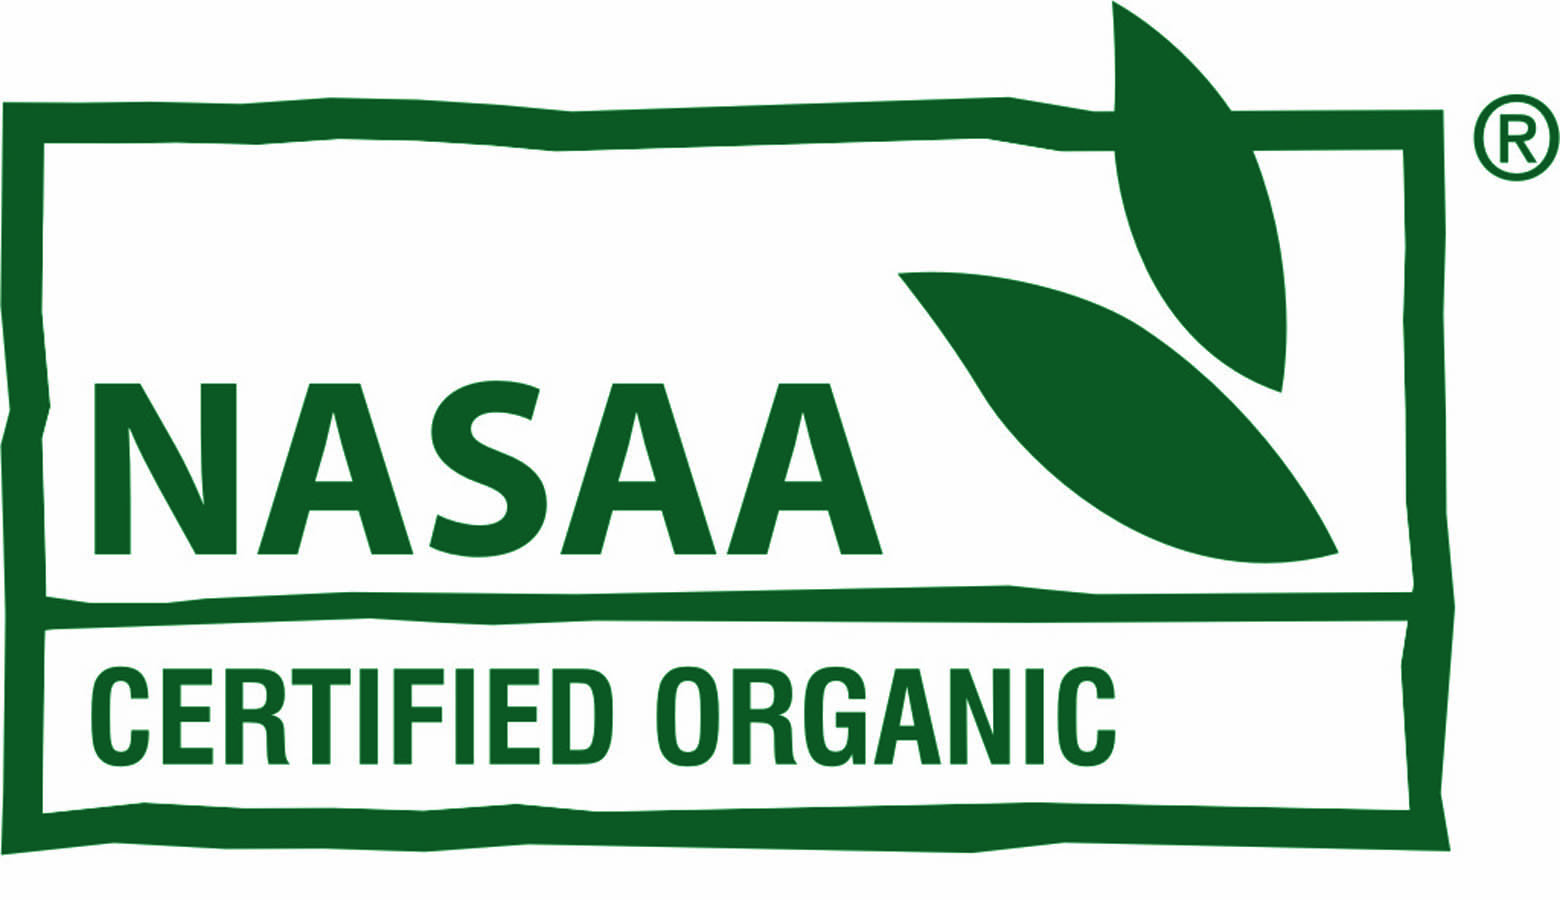 Nasaa Certified Organic Logo